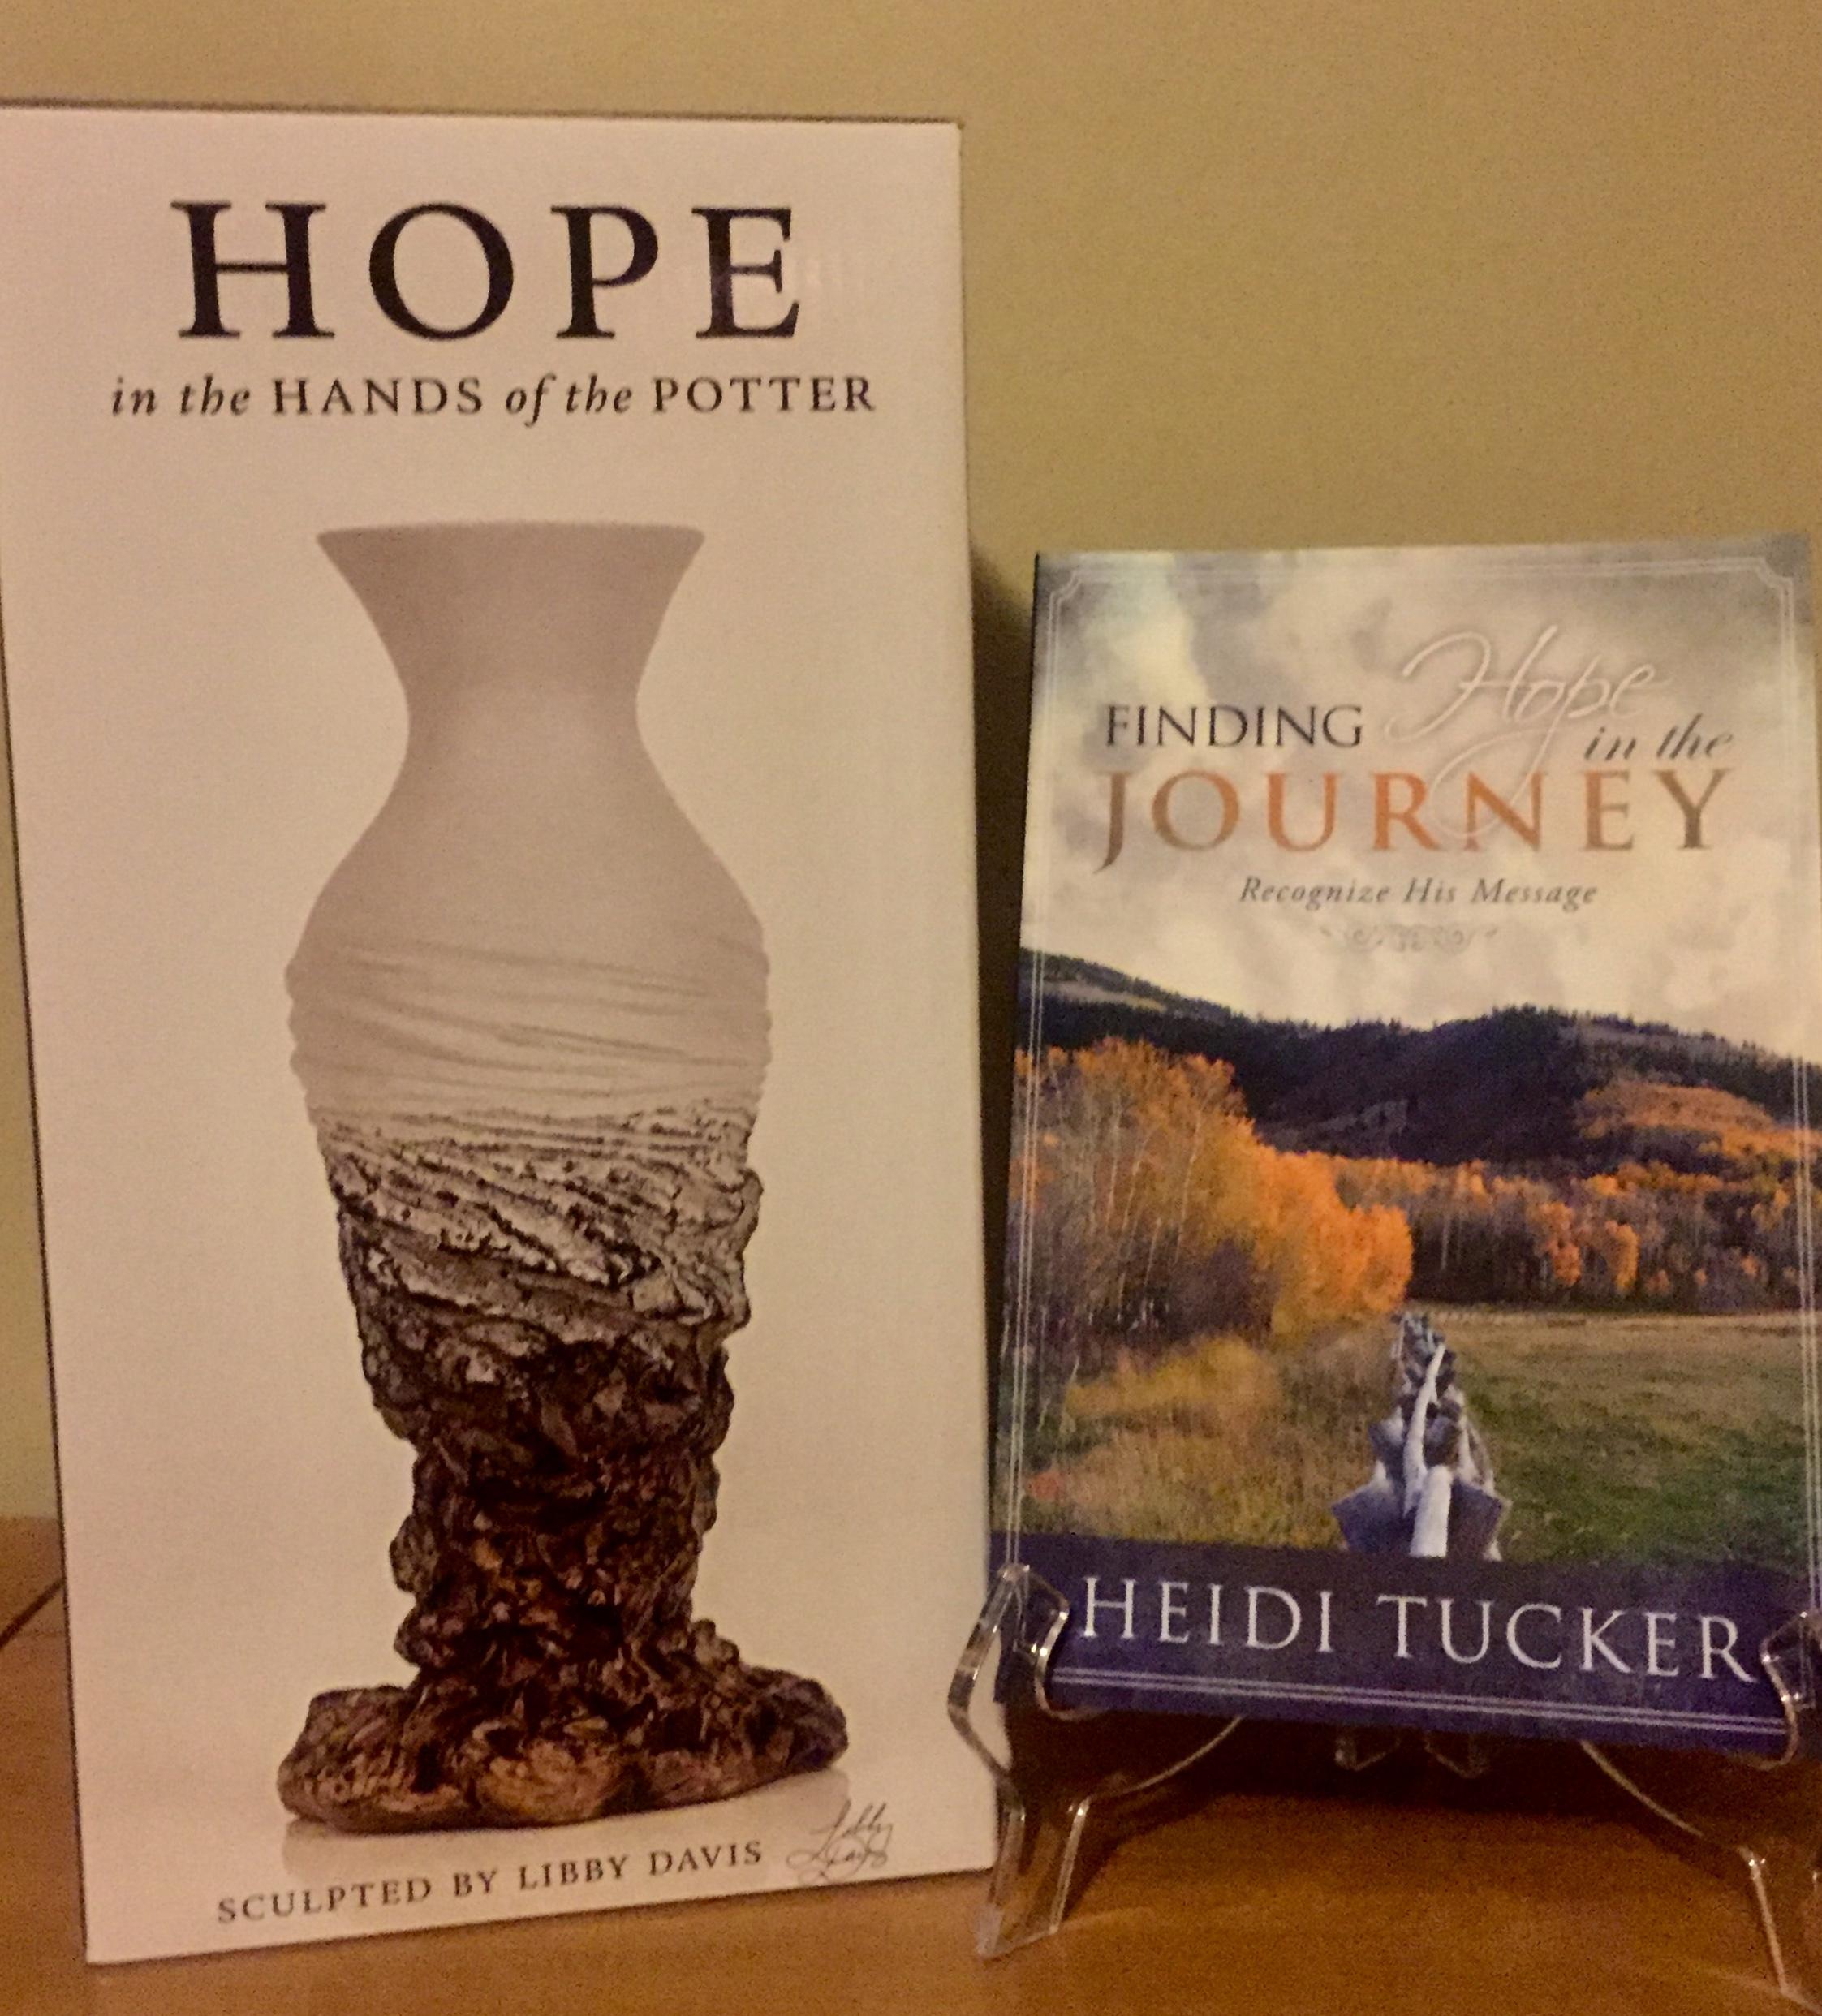 Hope vase and book.jpg